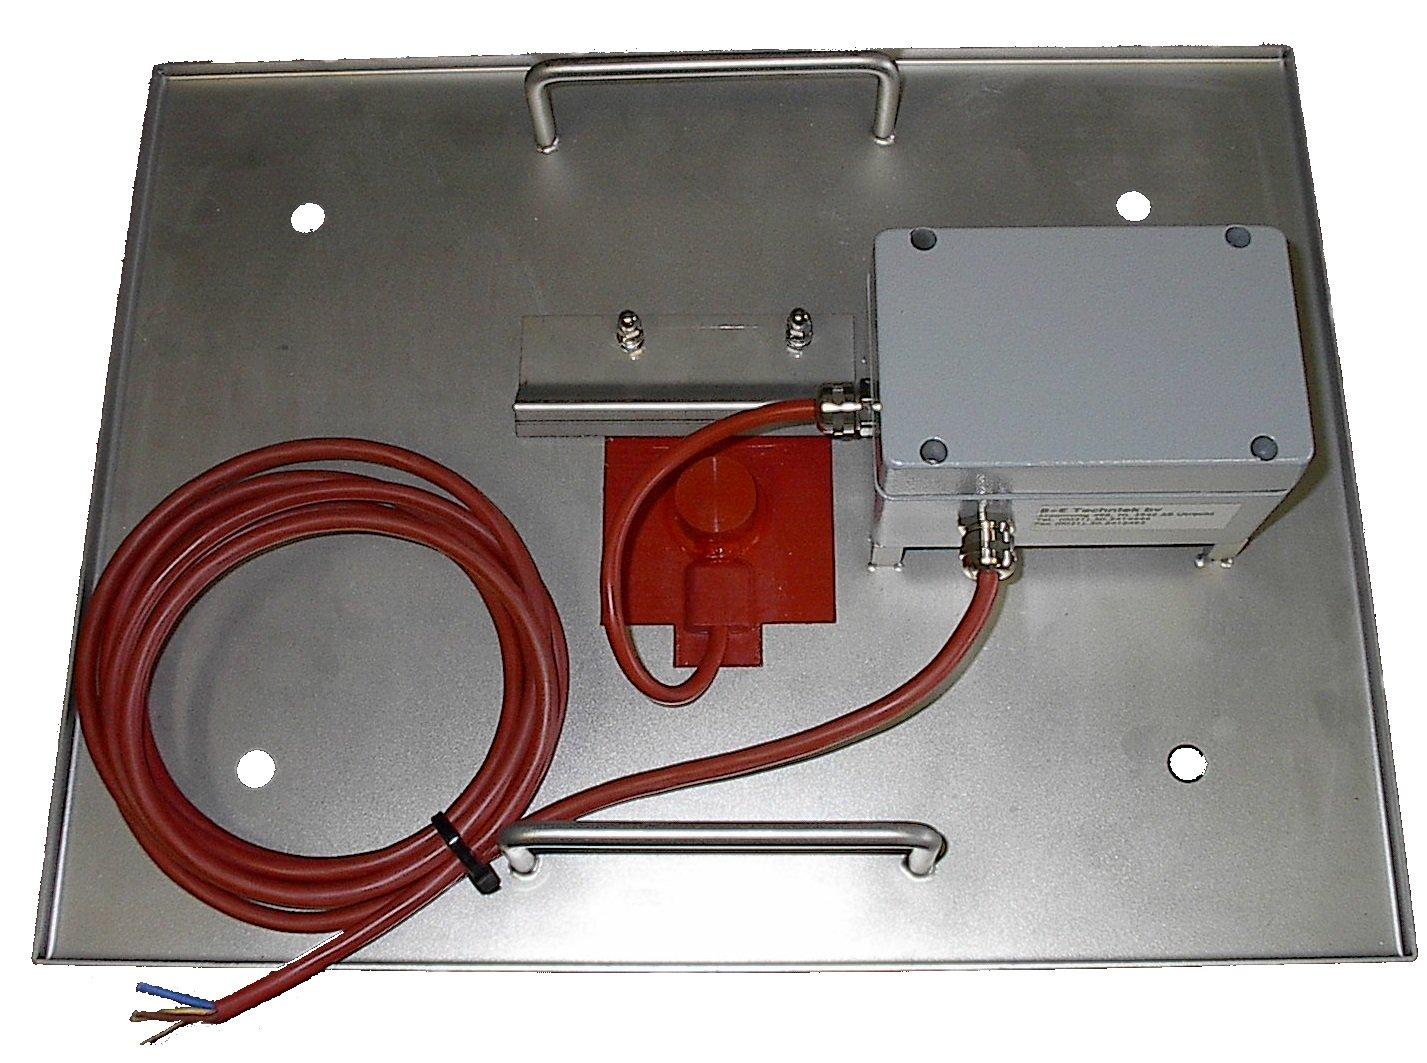 BE Techniek - verwarmingsmat onder warmplaat